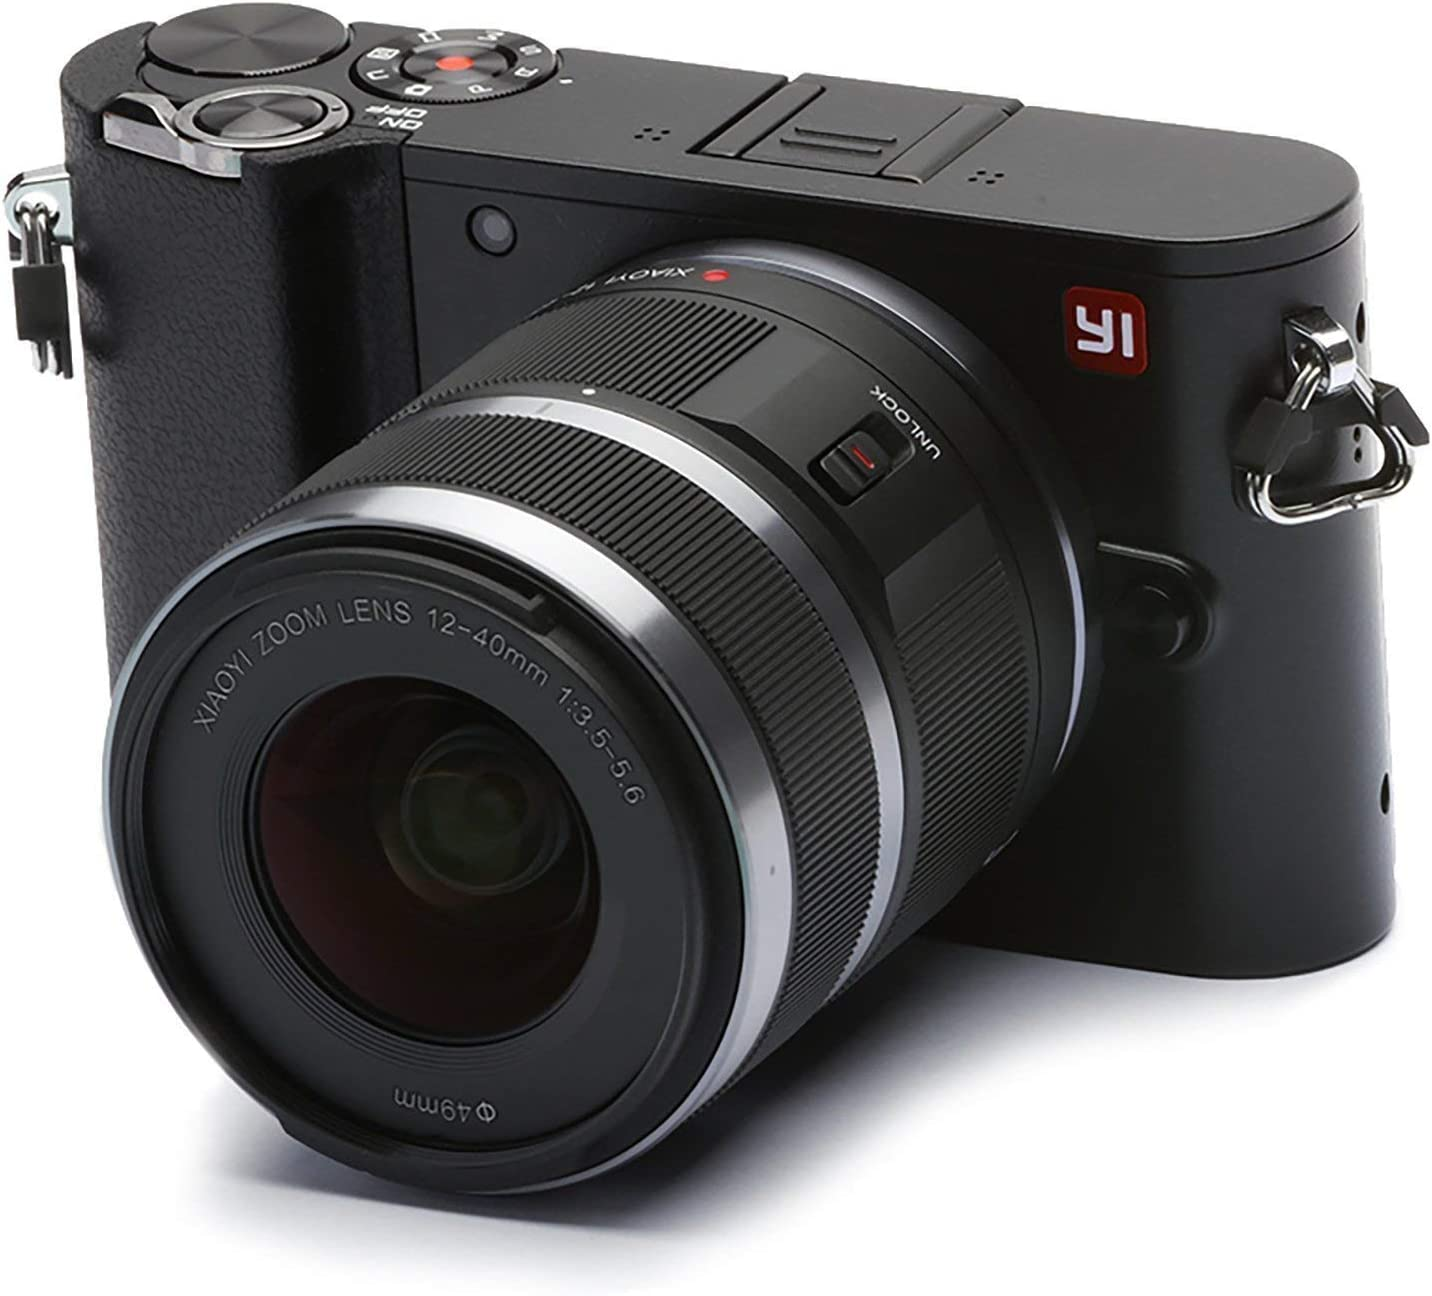 Yi Technology M1 95017 Mirrorless Digitalkamera Kamera